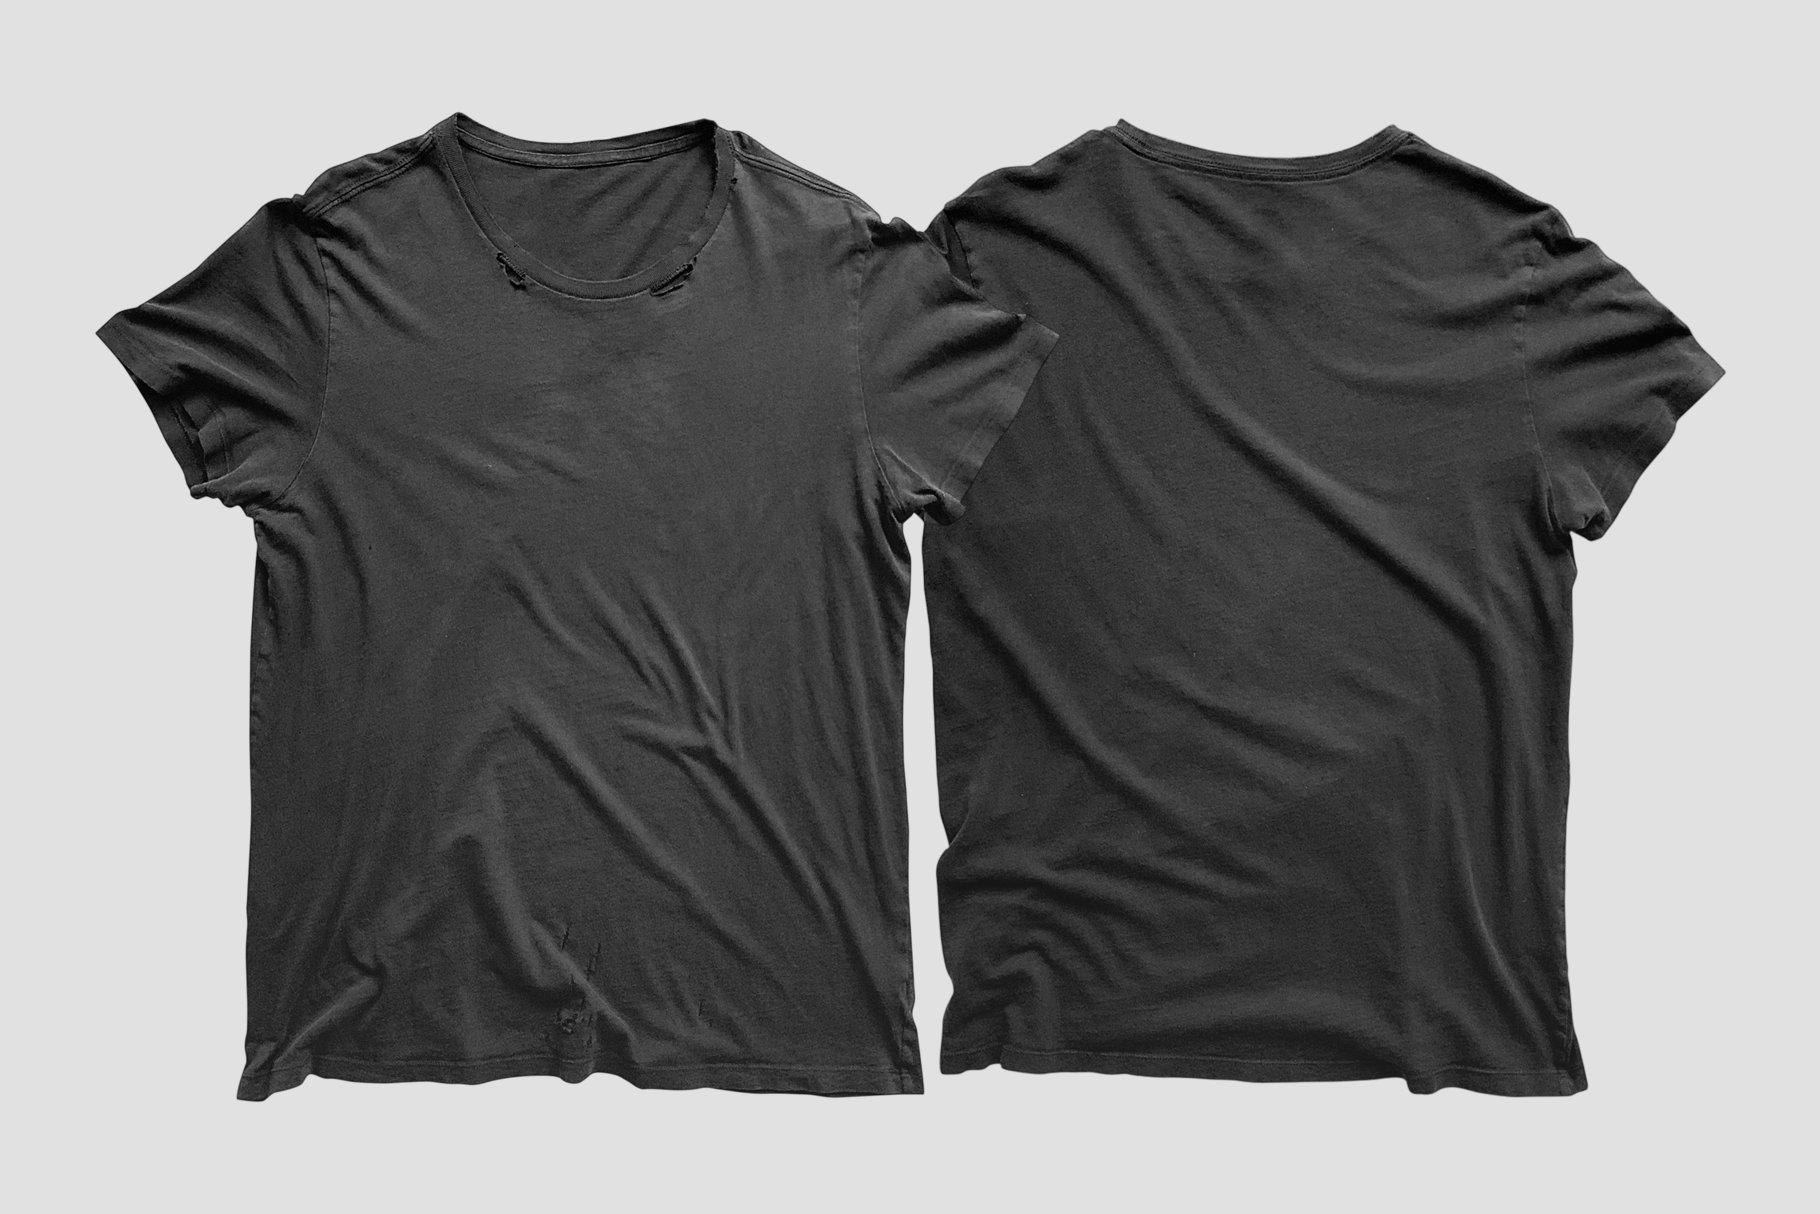 High Resolution Black T Shirt Mockup Png